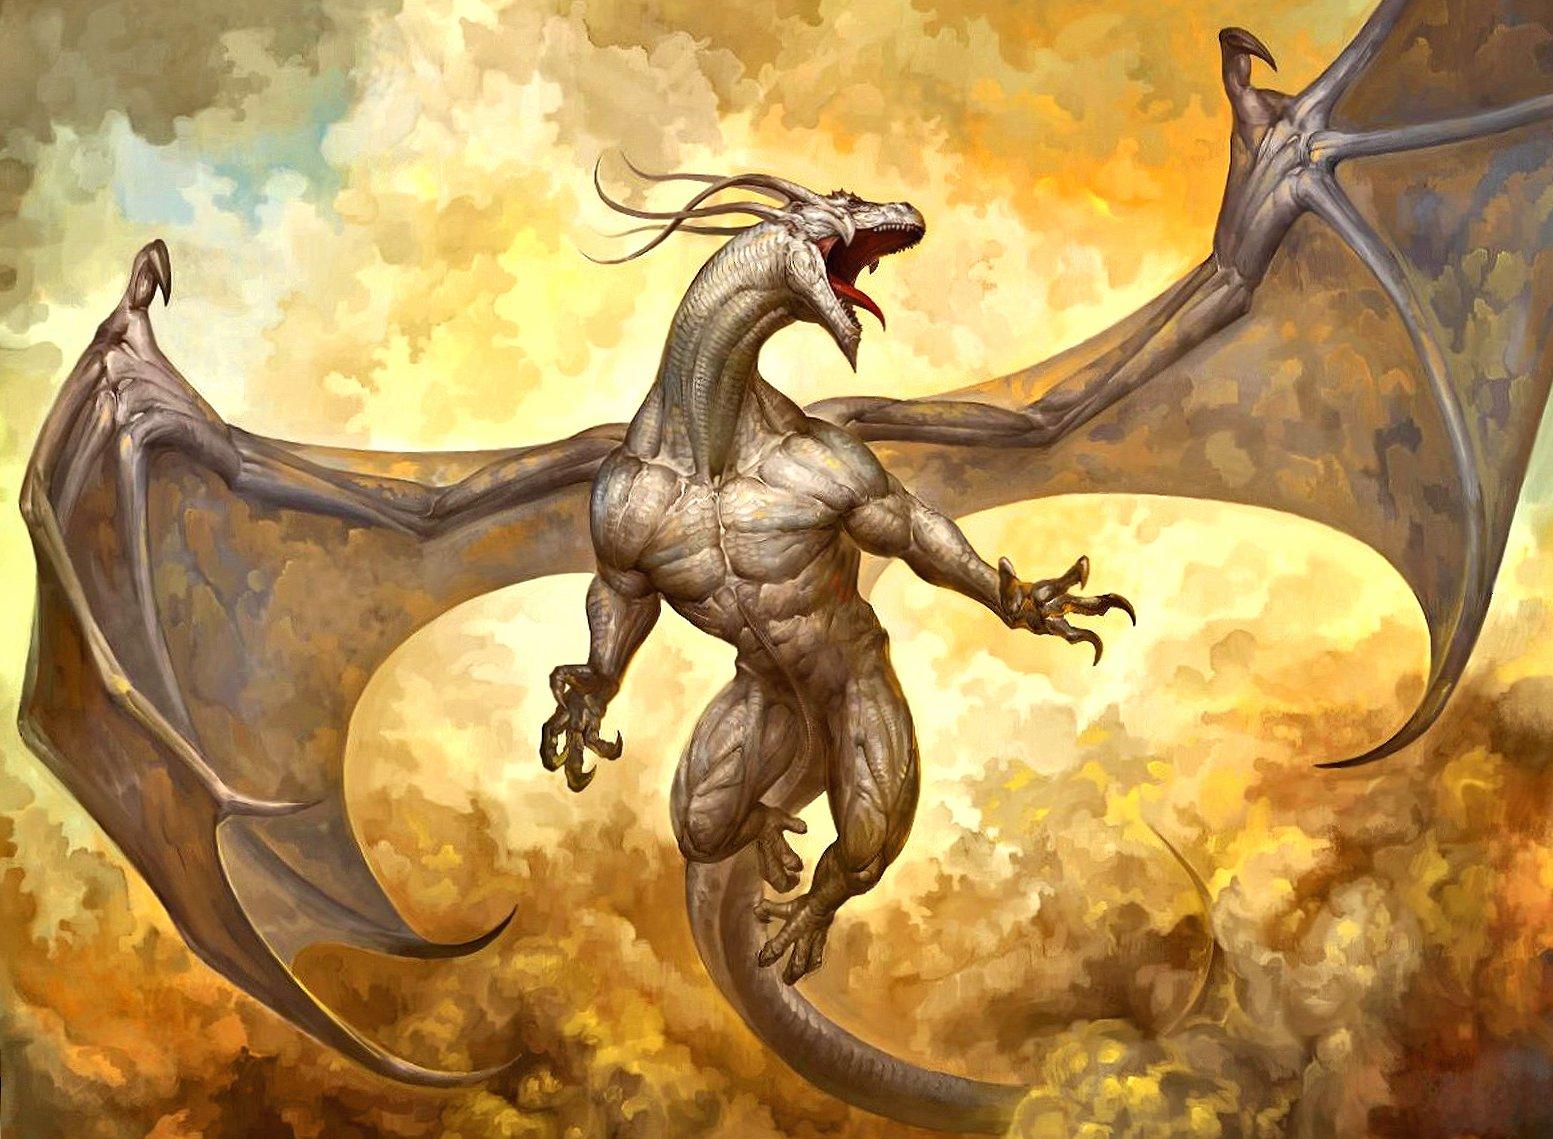 Humanoid dragon wallpapers HD quality